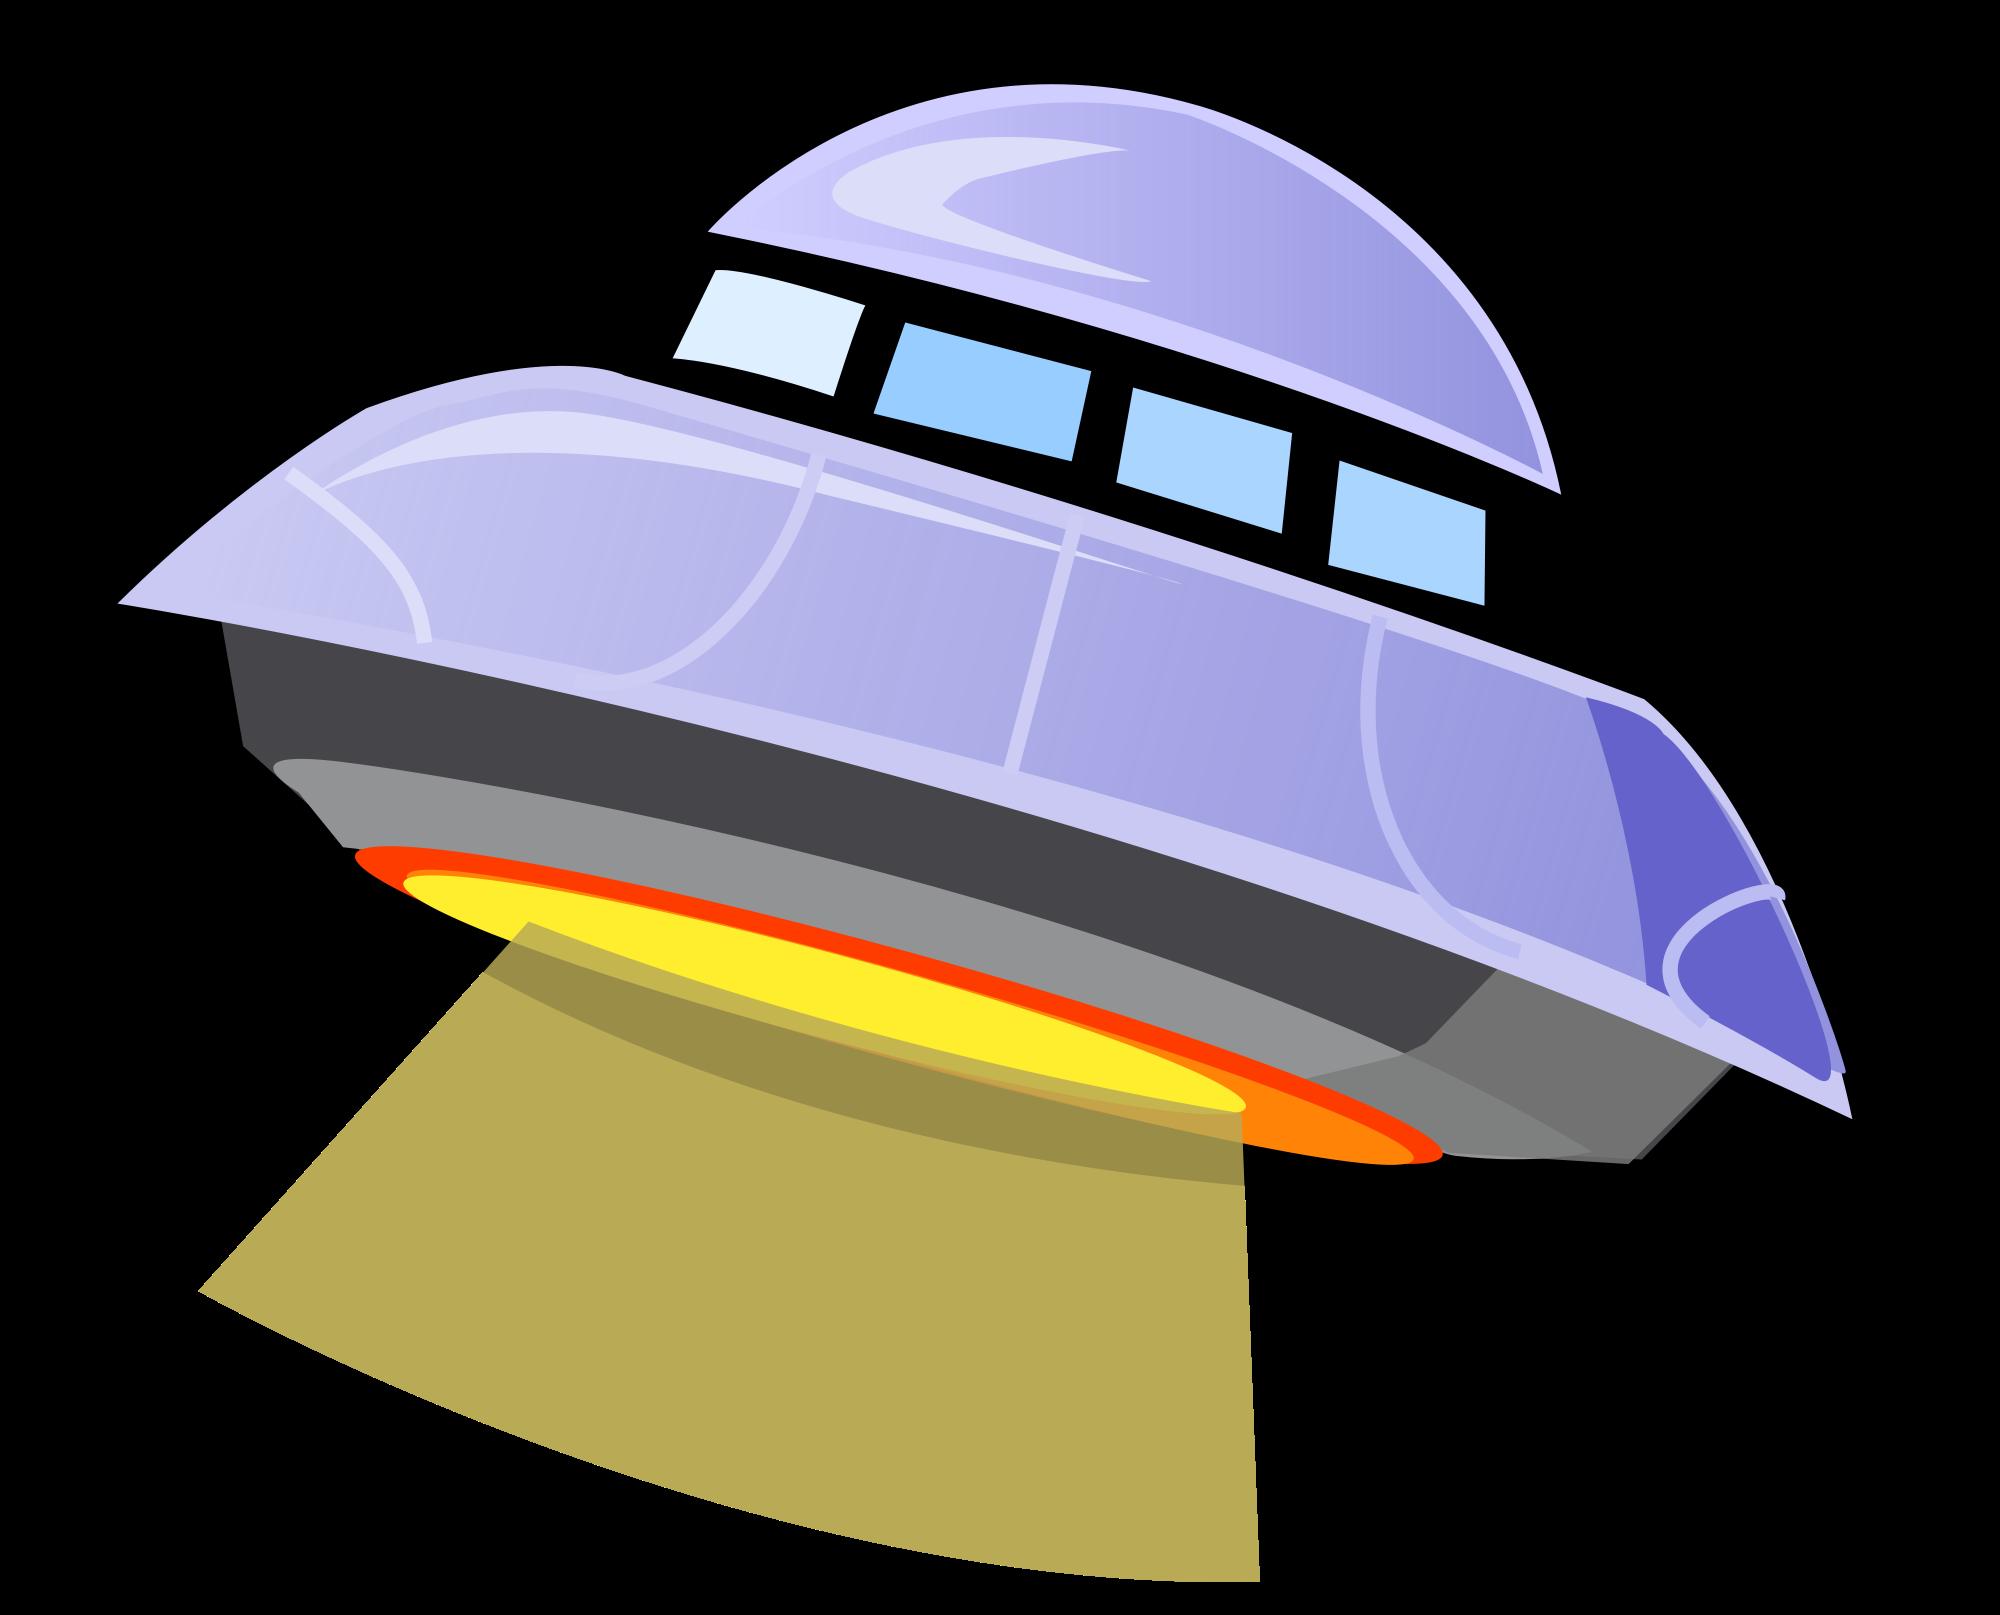 spaceship clipart bitmap